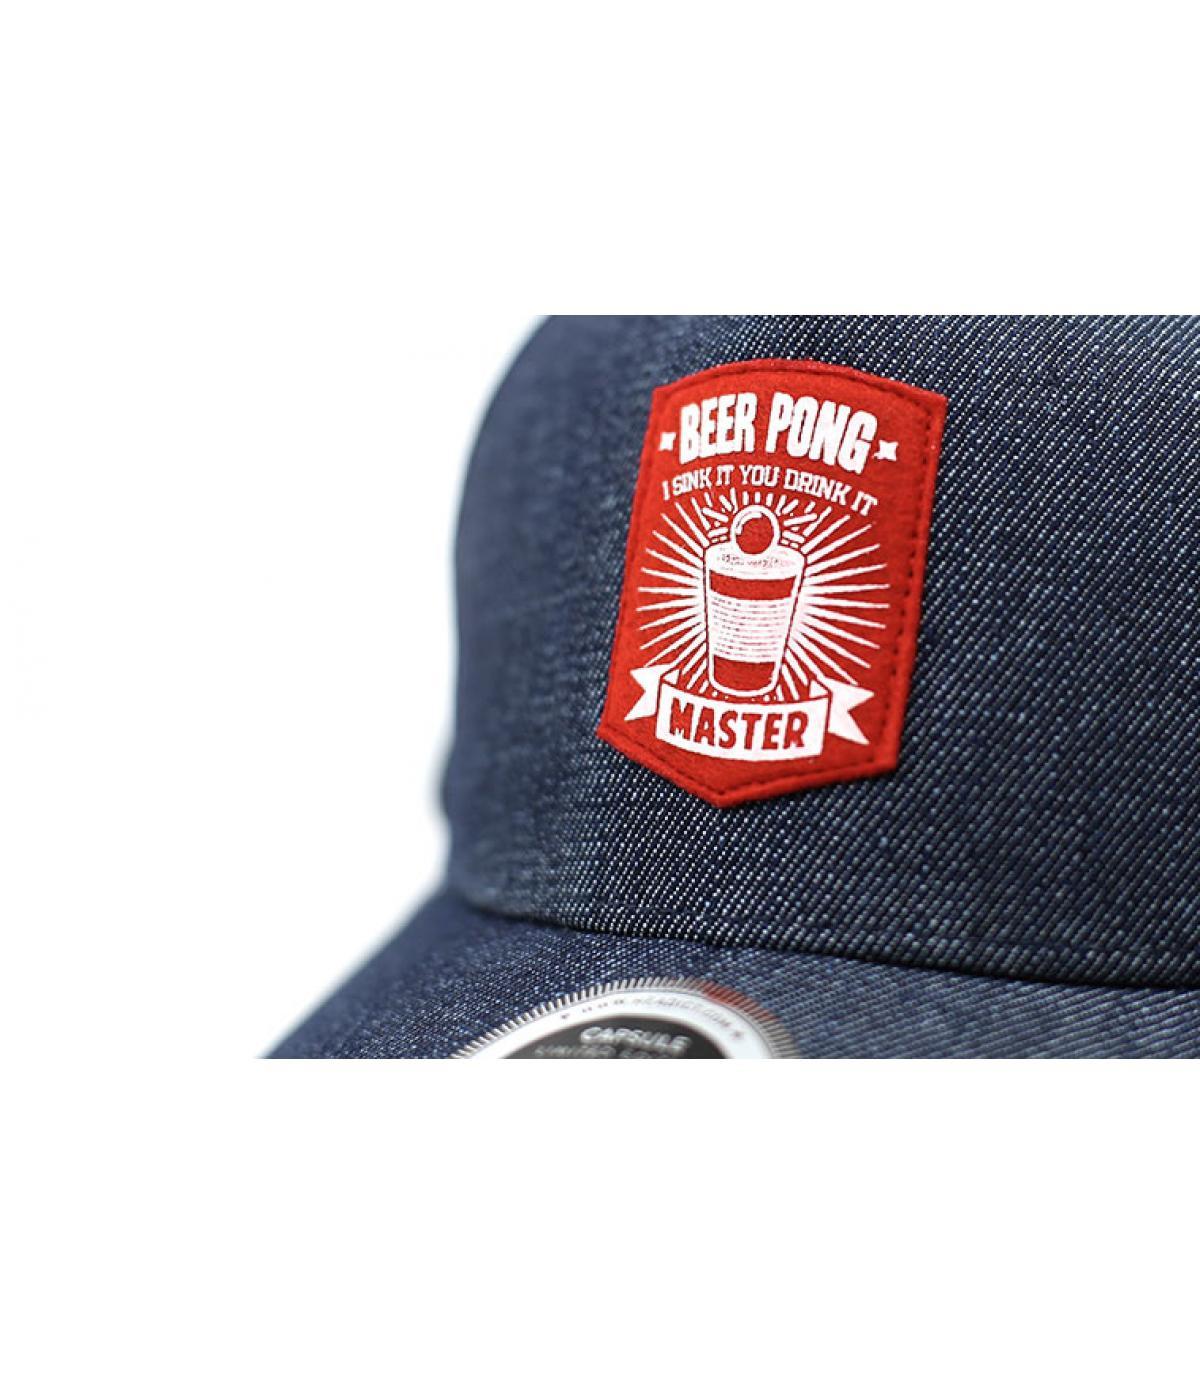 Details Trucker Beer Pong Master - Abbildung 3